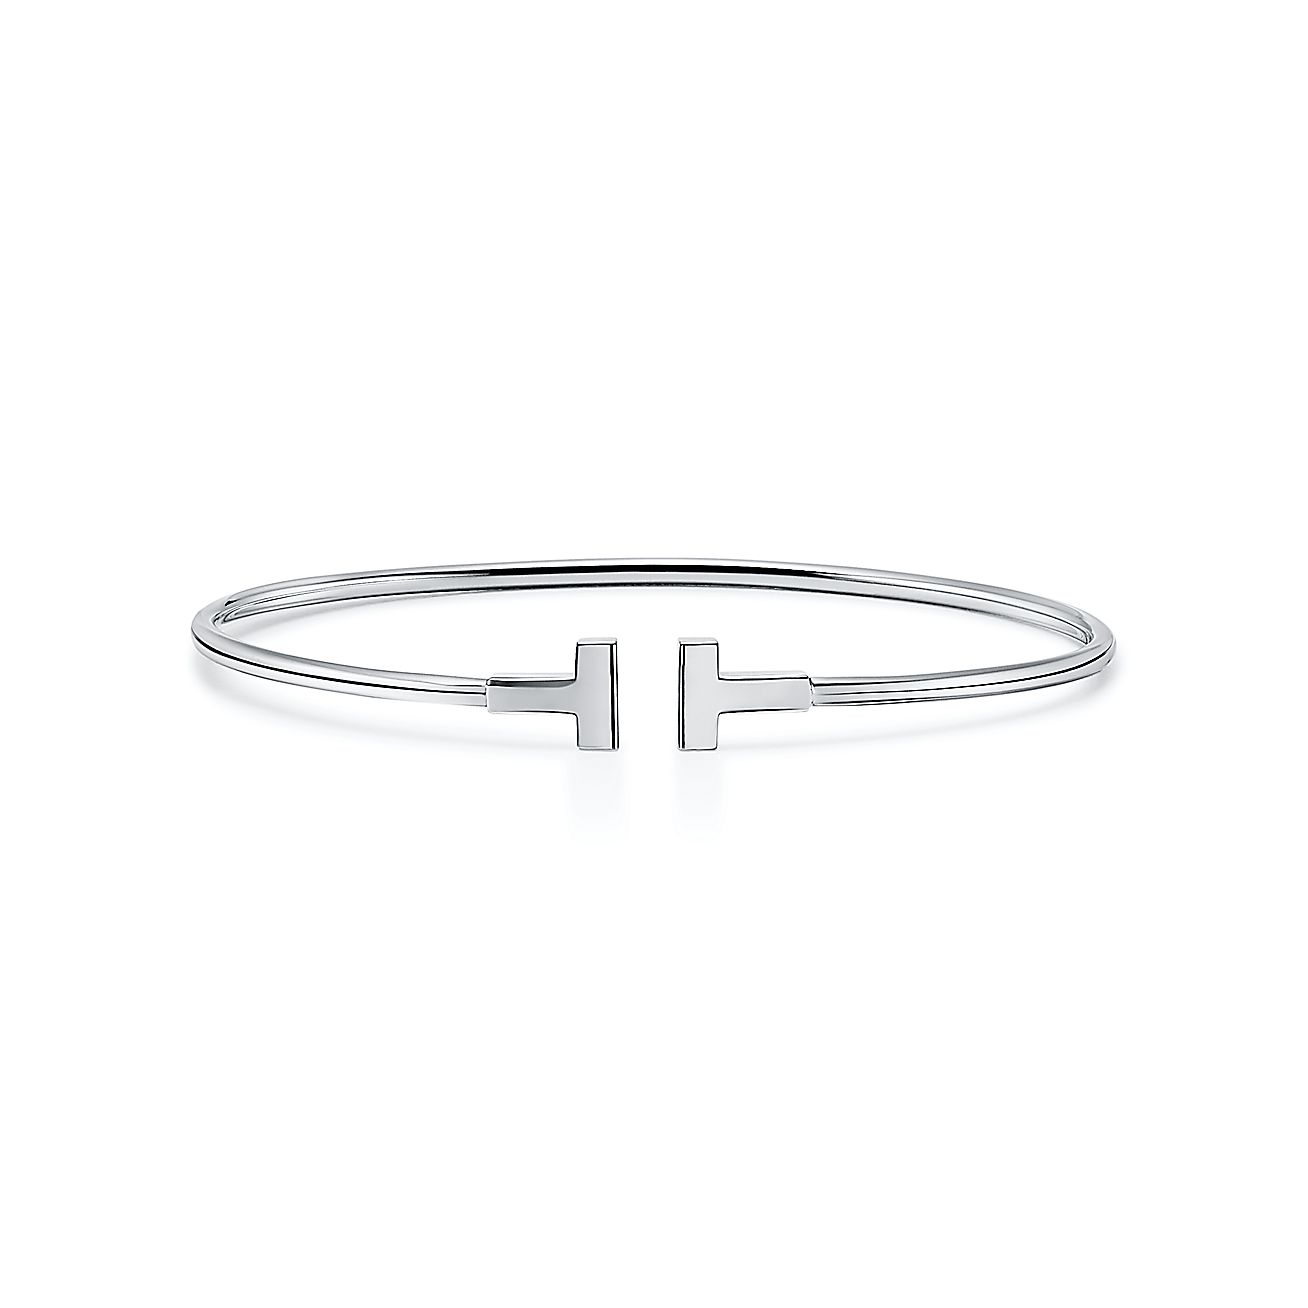 Tiffany T Narrow Wire Bracelet In 18k White Gold Medium Tiffany Co